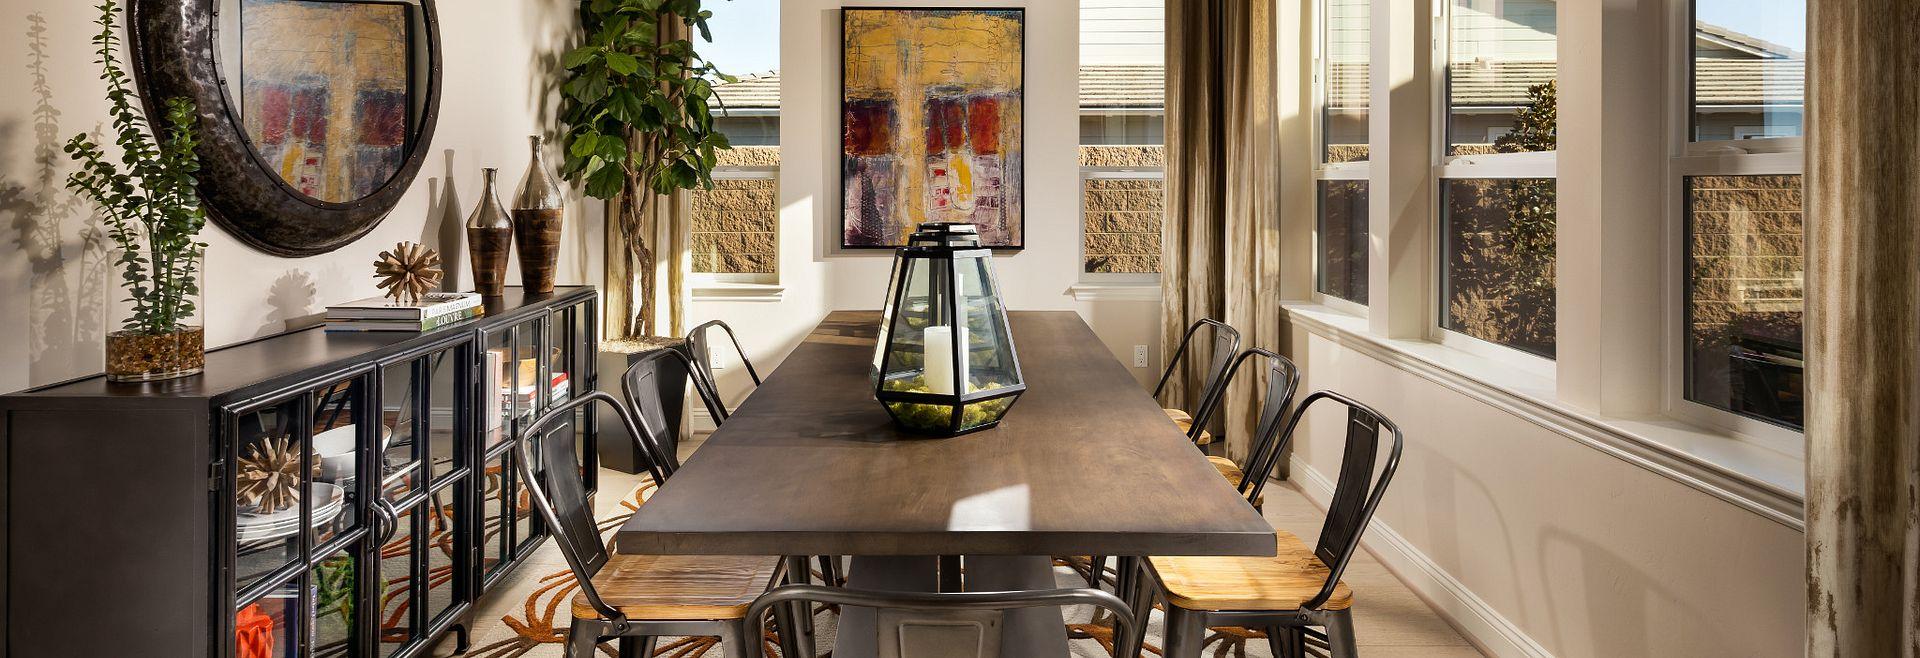 Trilogy Monarch Dunes Avila Dining Room